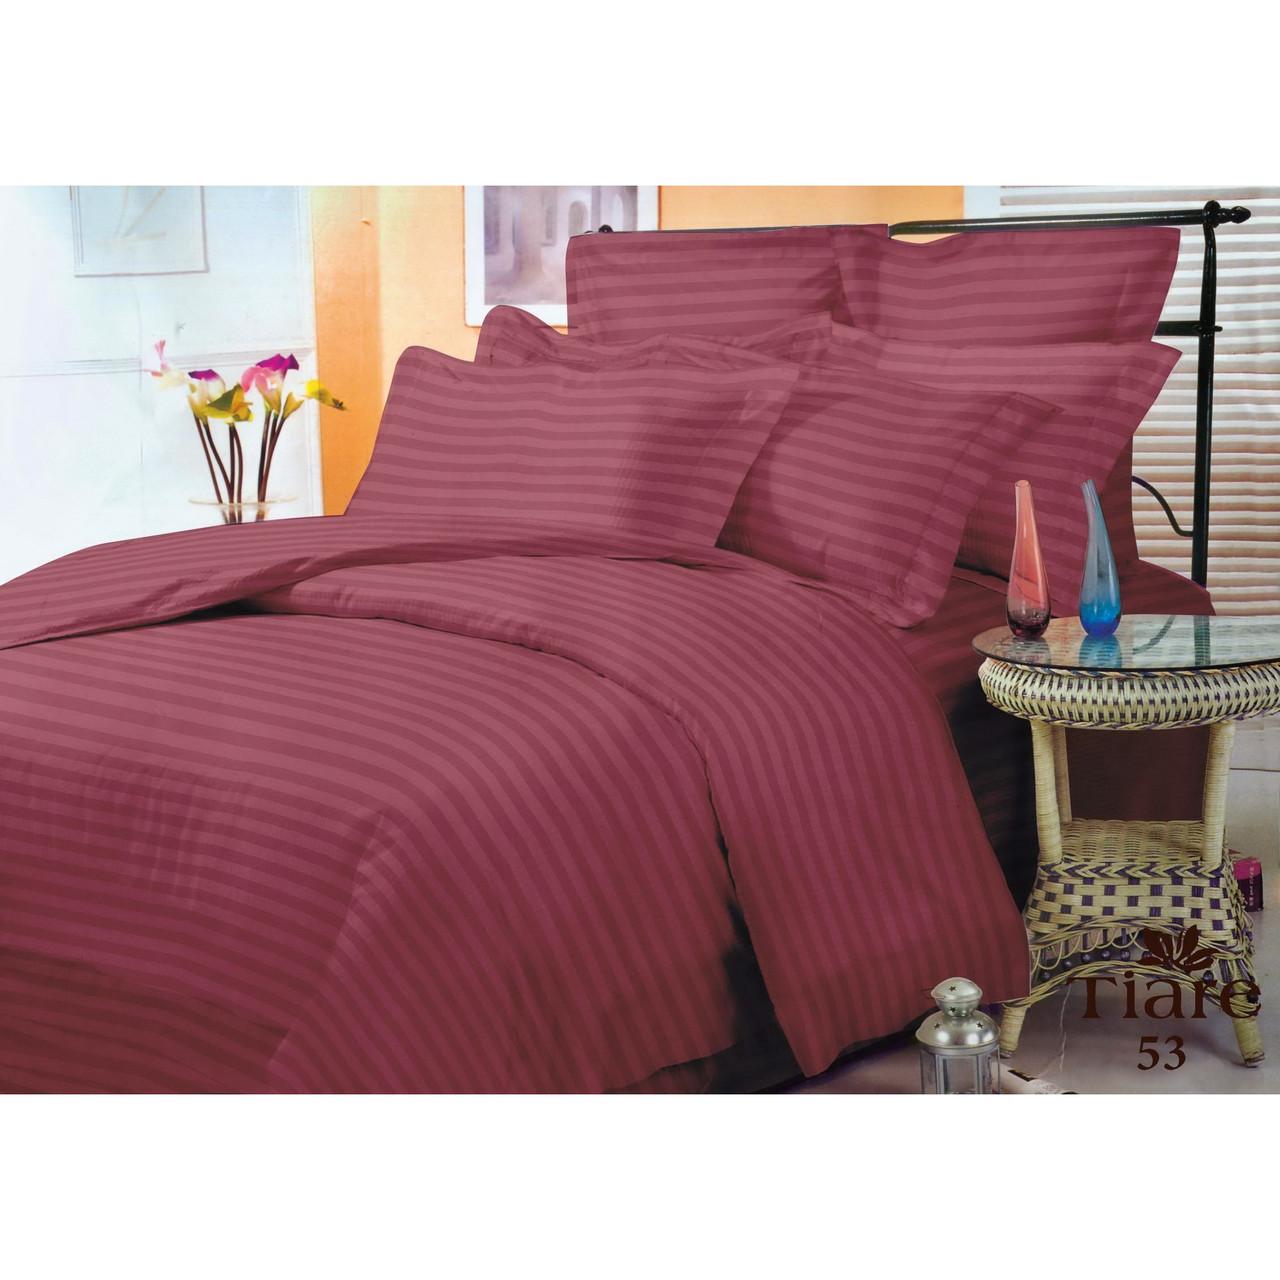 Комплект постельного белья Семейний Сатин Stripe 53 Tiare™